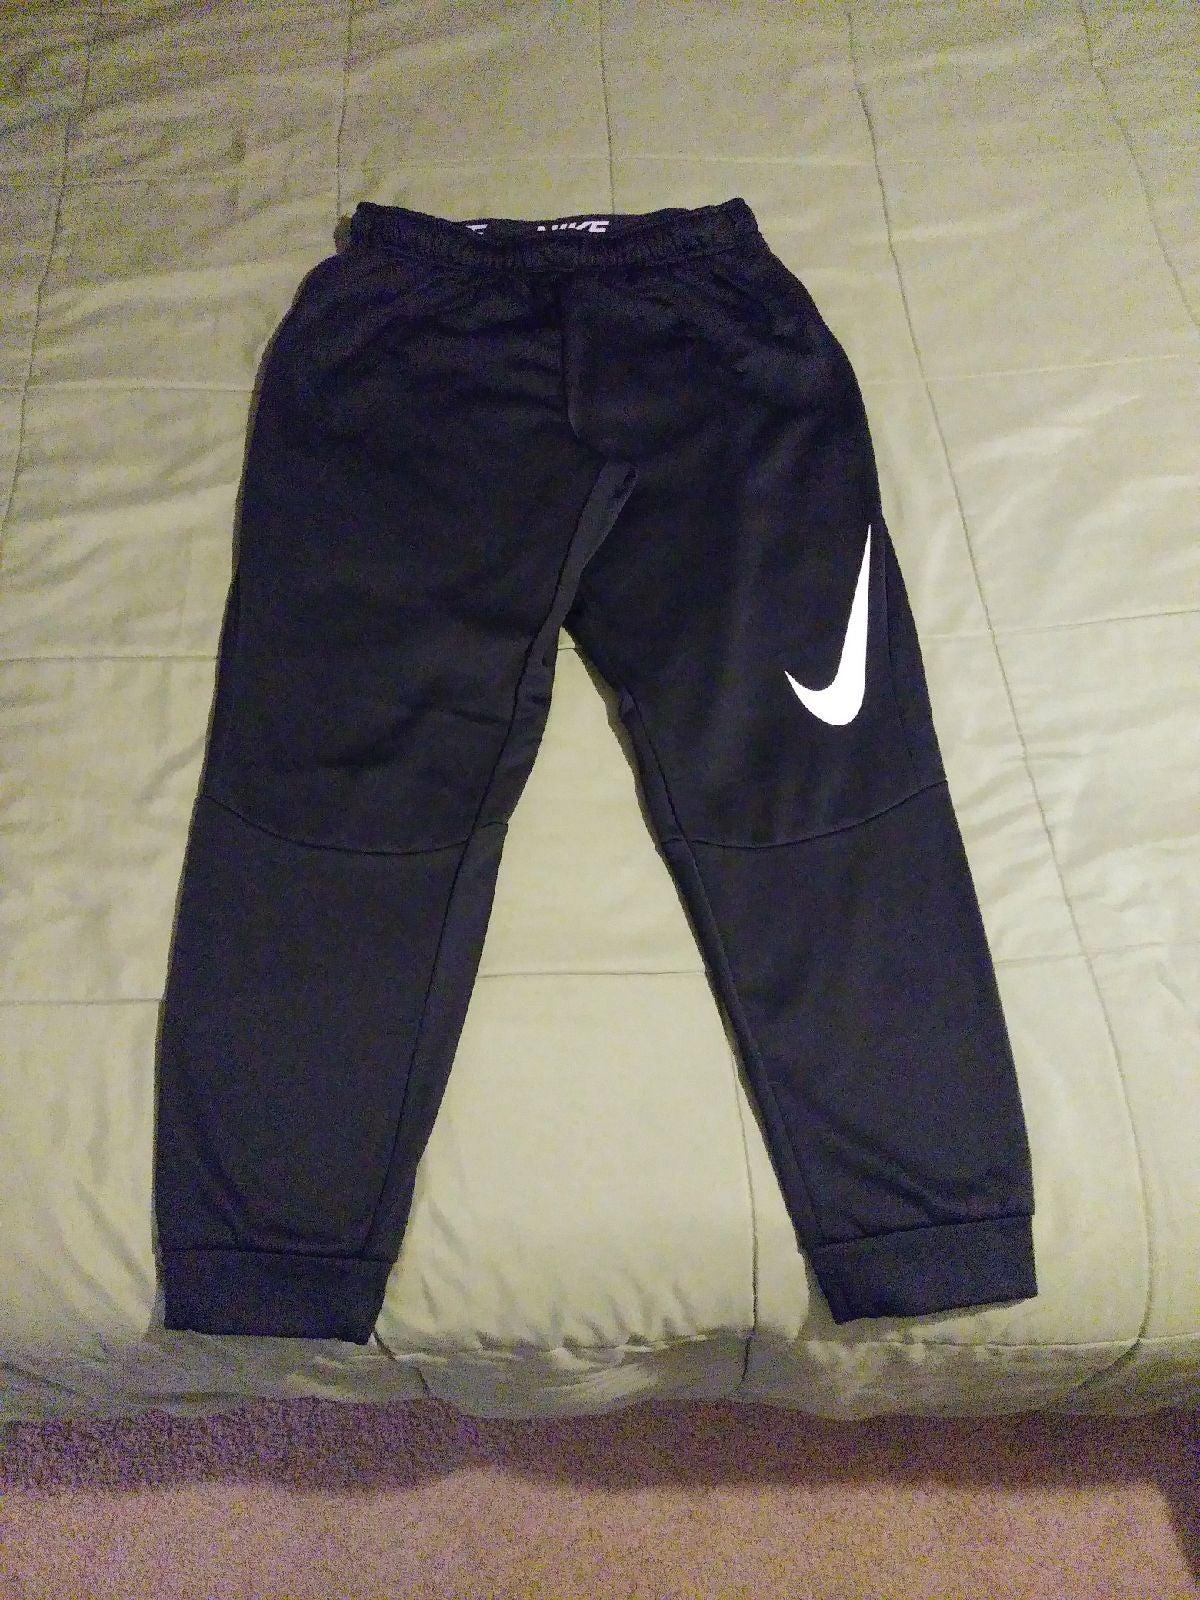 Nike sweatpants / nike joggers